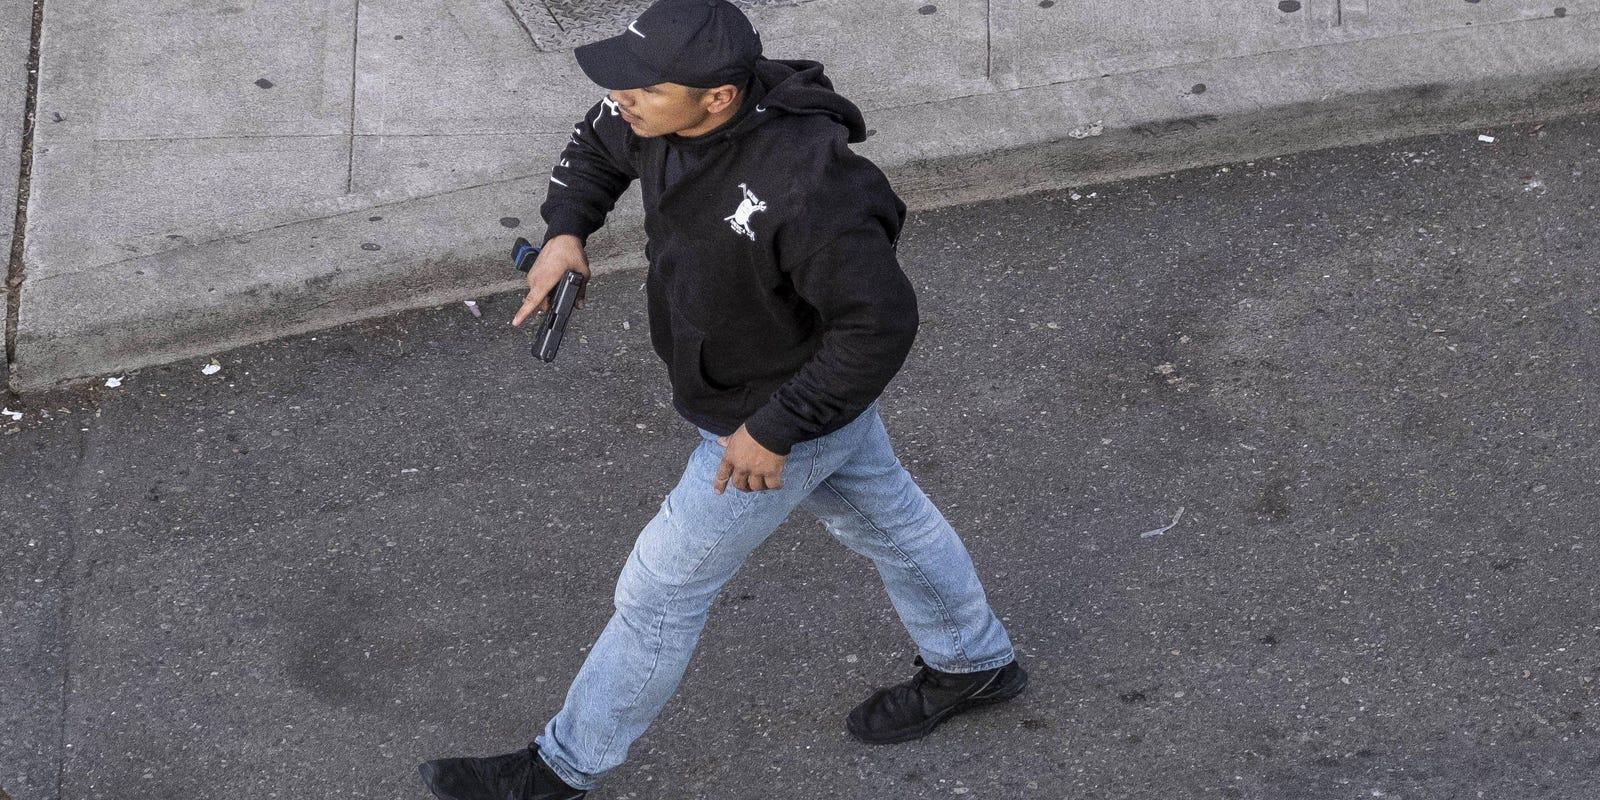 Fact check: CNN did not lighten image of alleged Seattle shooter